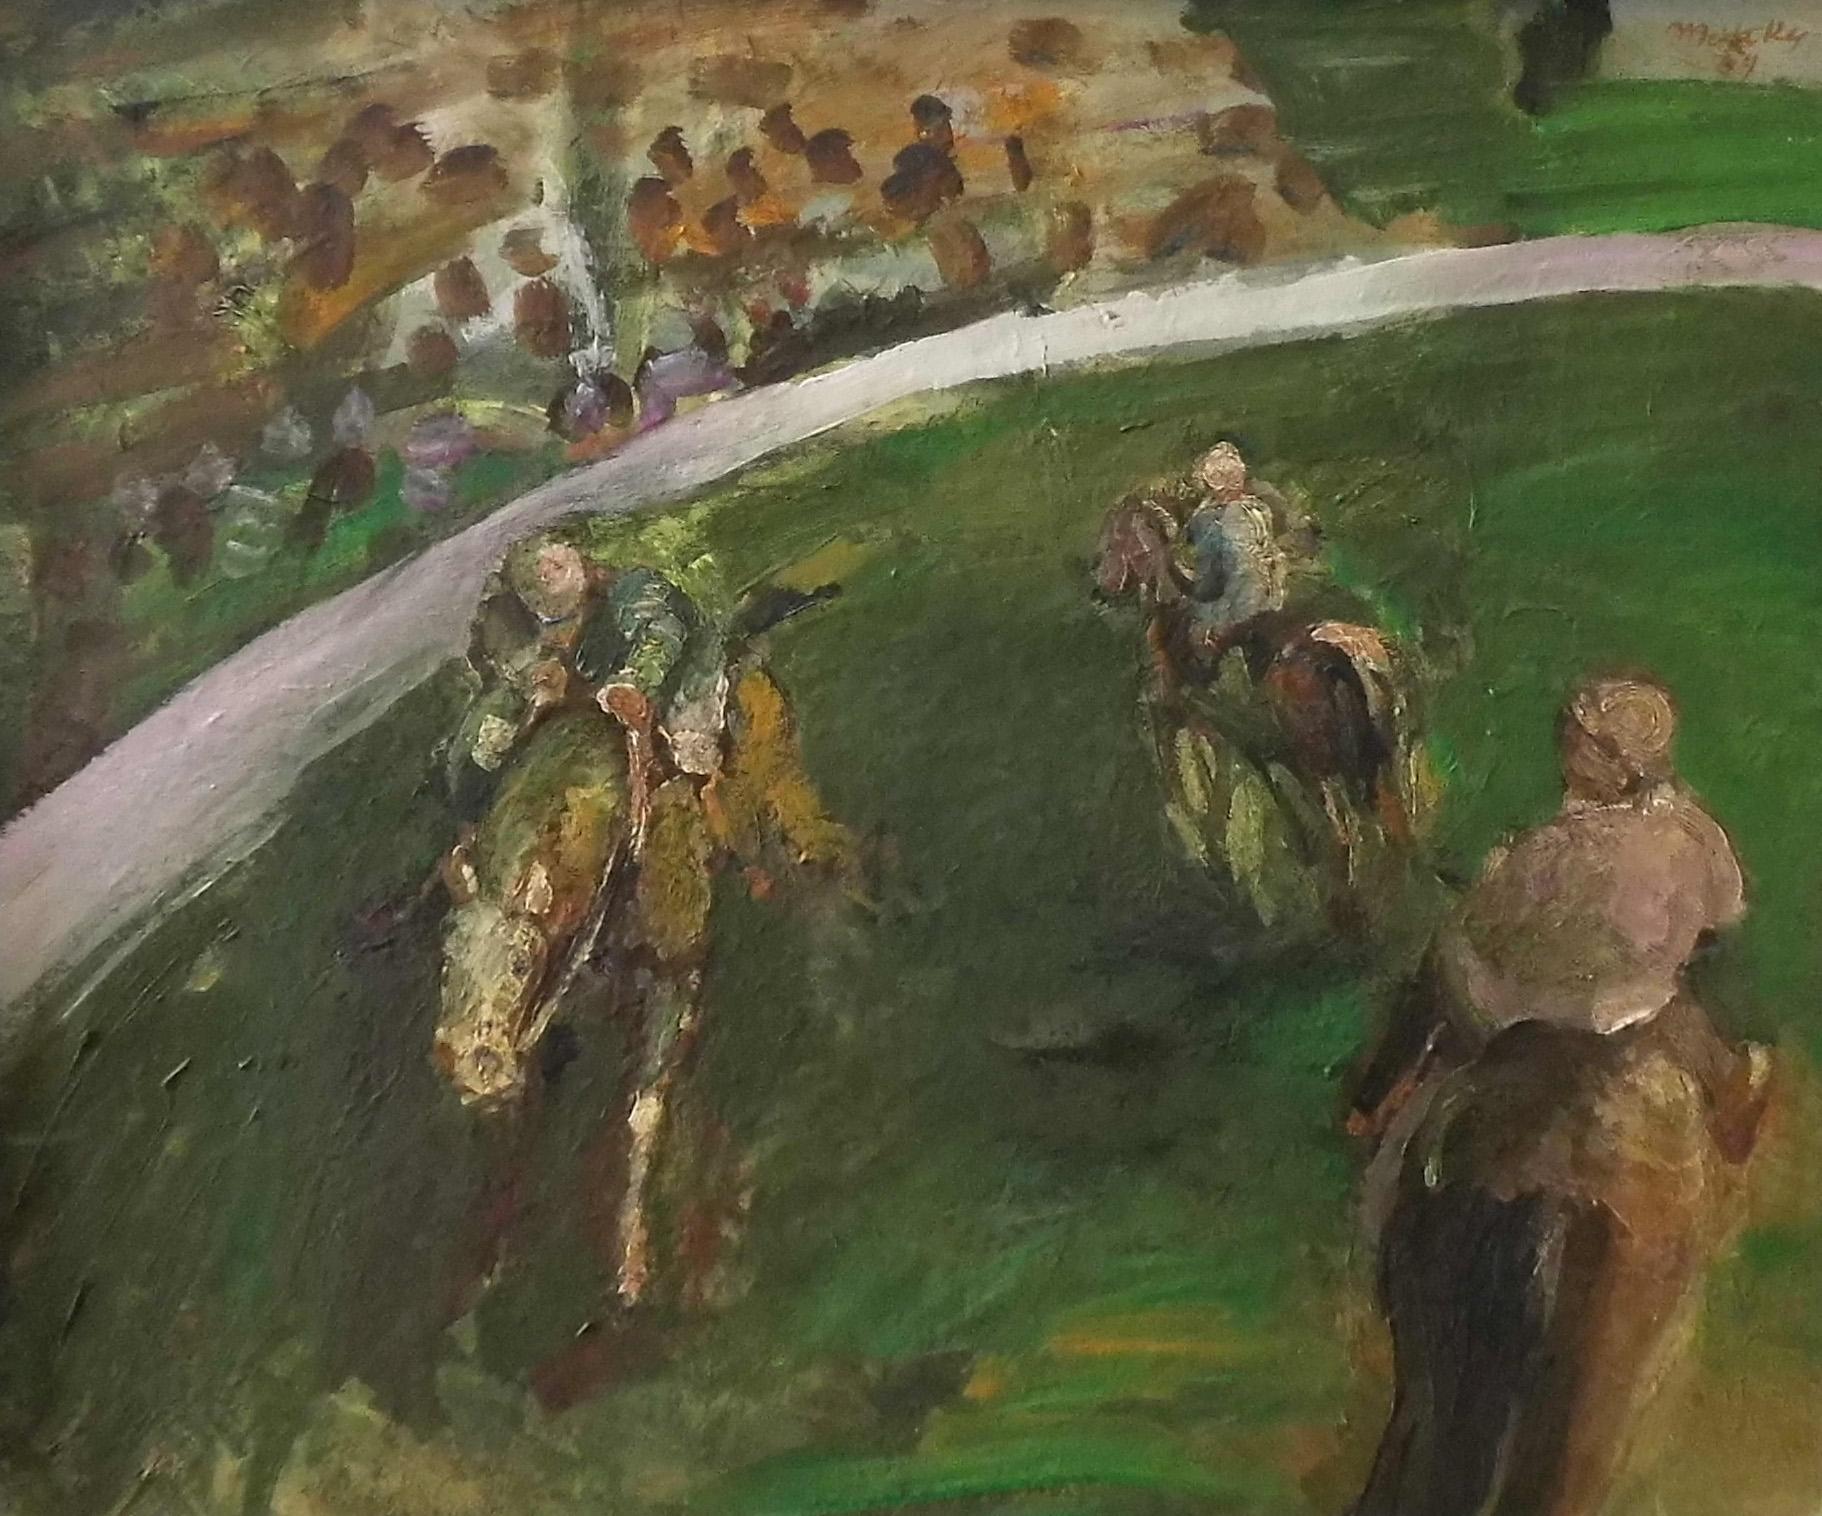 09-harald_metzkes-trainierende_jockeys-1969-oel_auf_leinwand-50x60